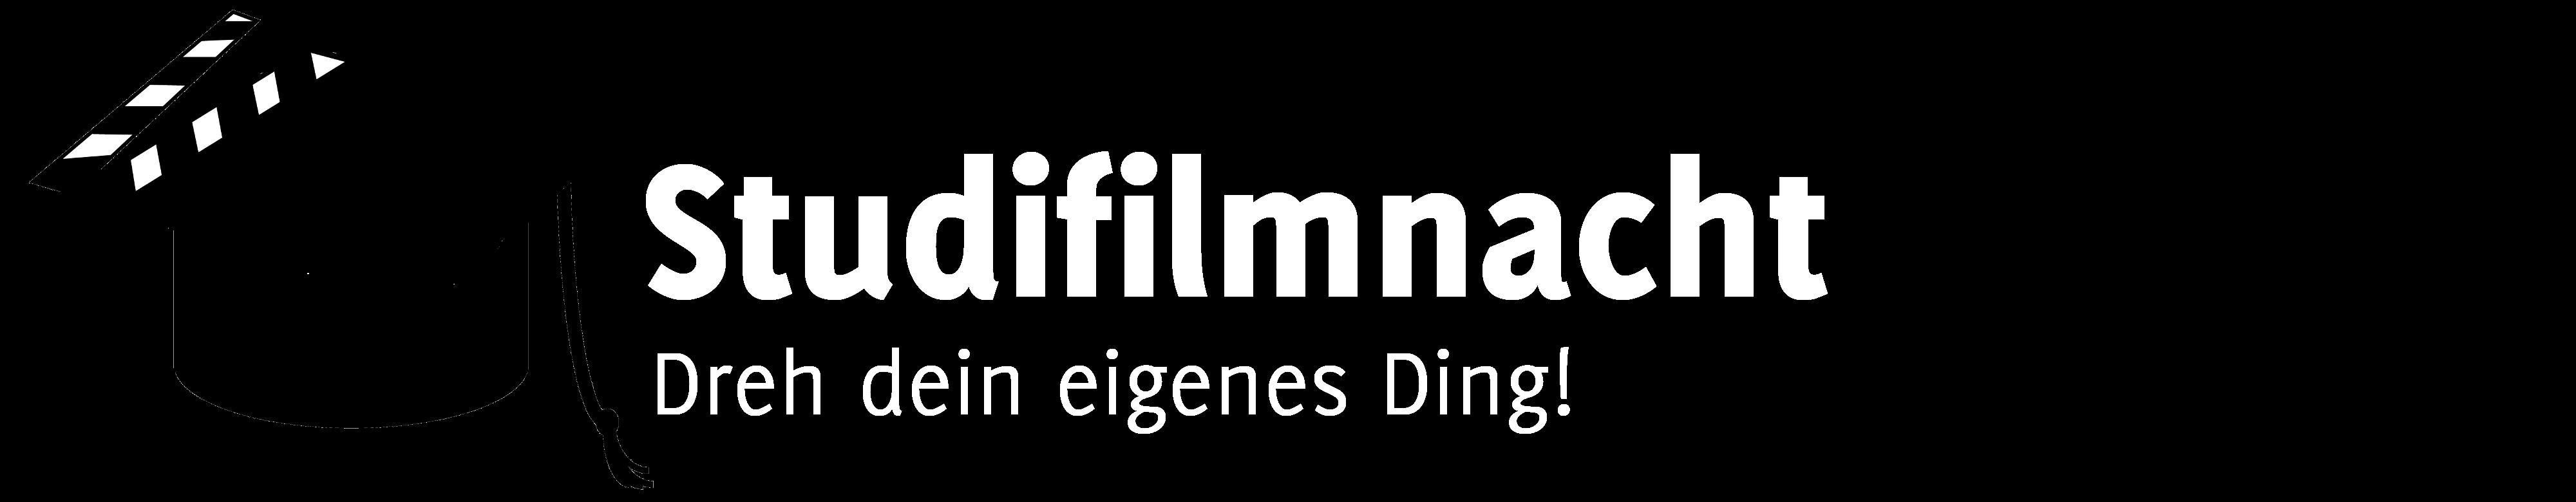 Studifilmnacht Paderborn